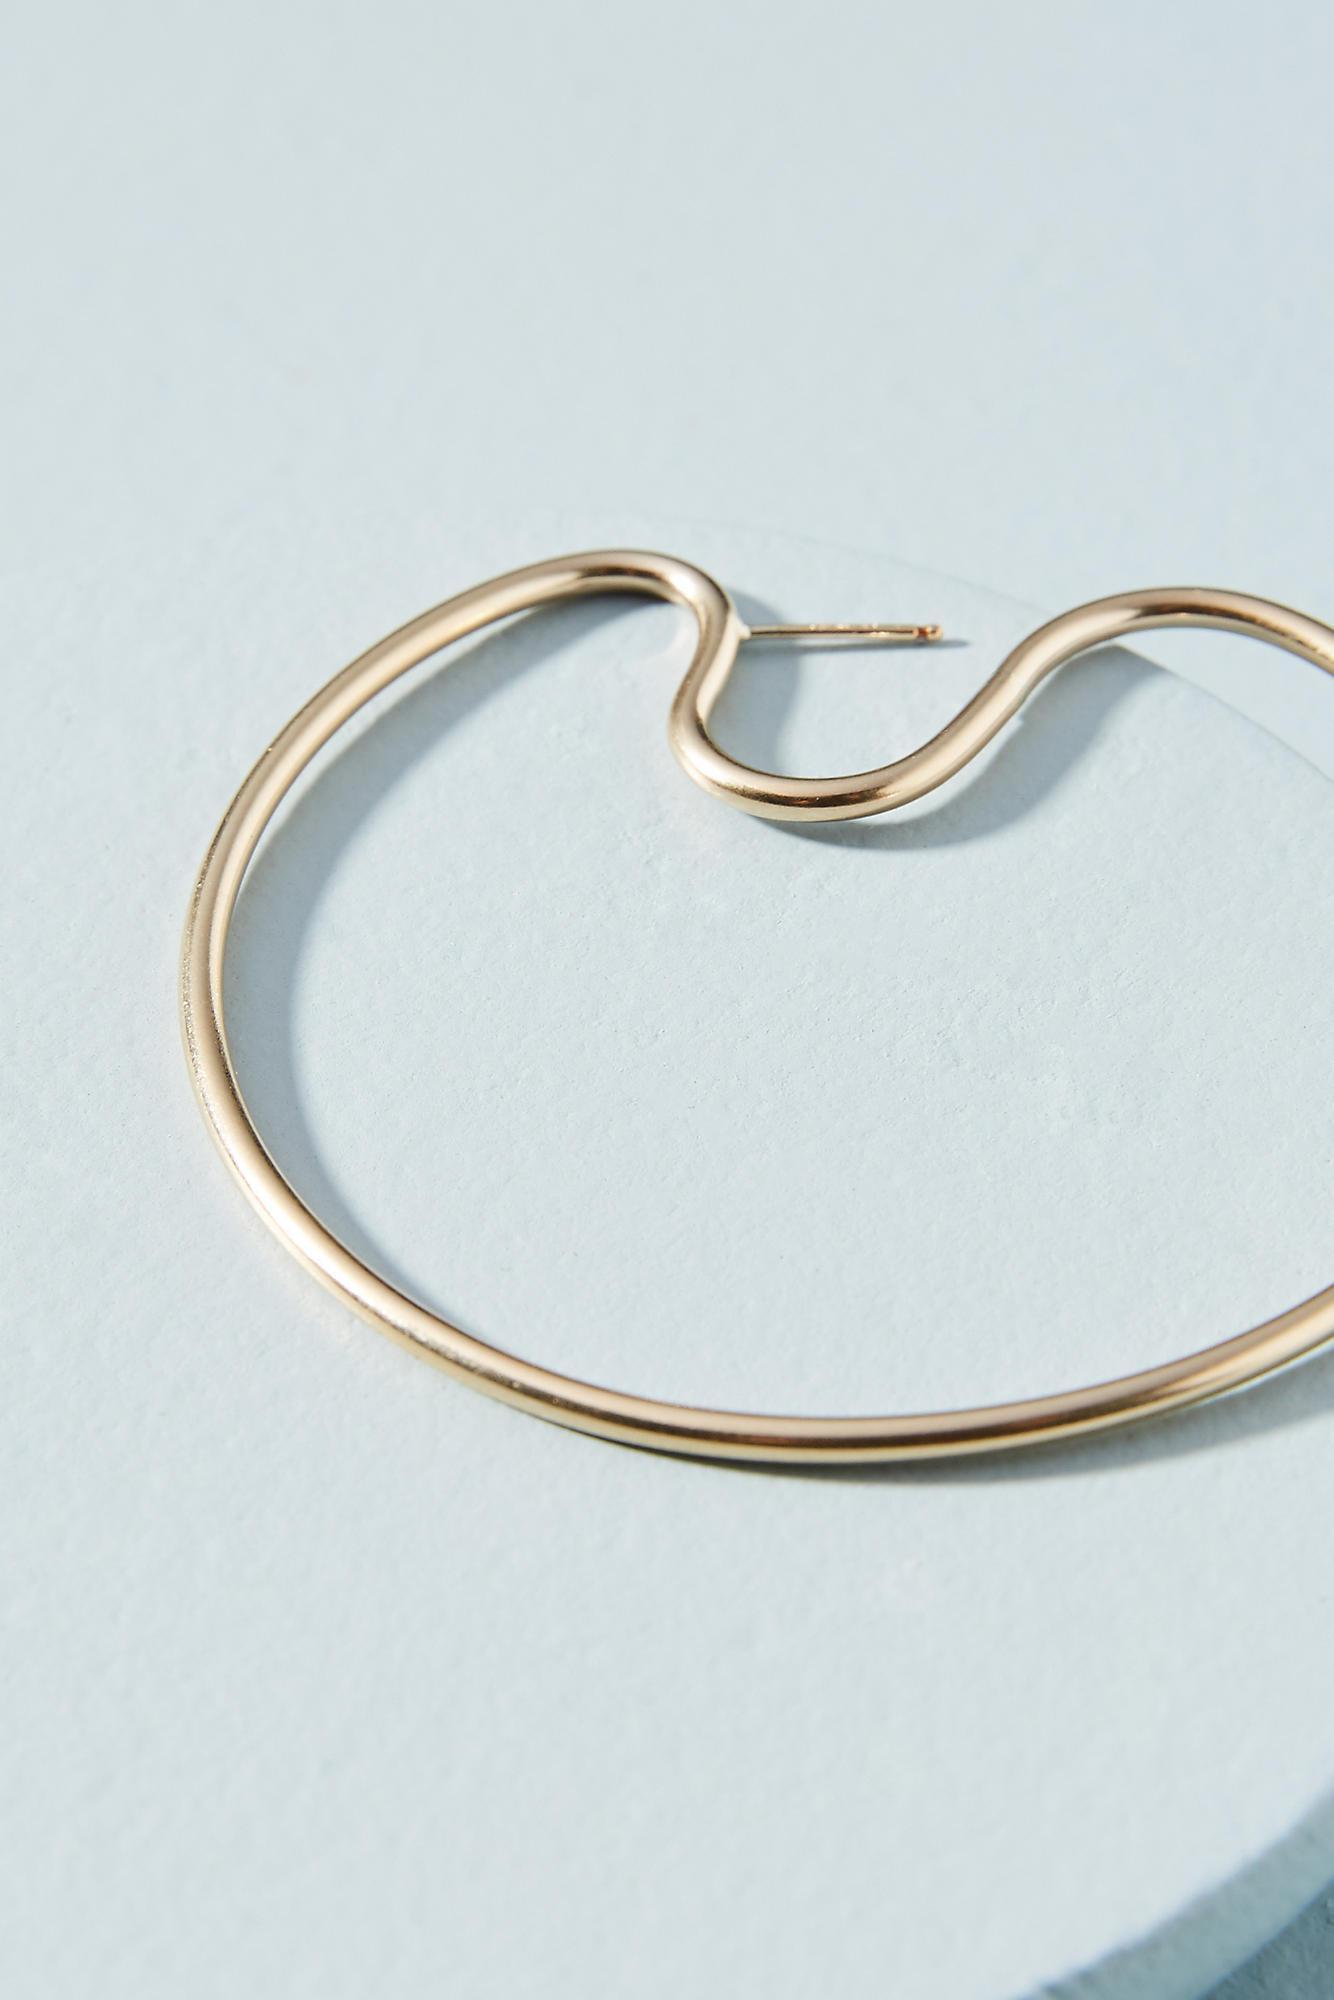 Anthropologie Petite Bubble Hoop Earrings YskbIL